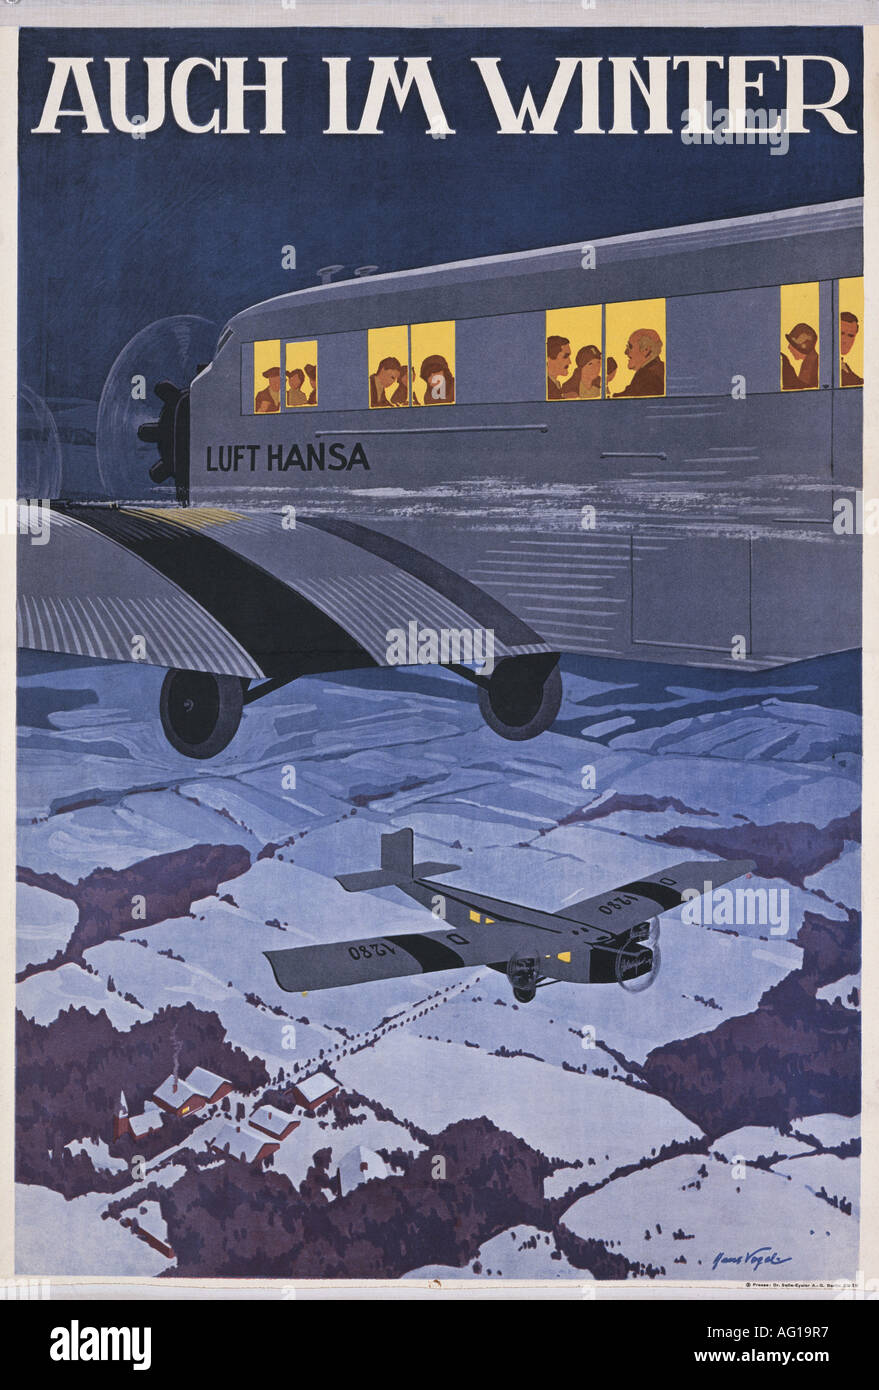 Poster design 1920s -  Advertising Transport Auch Im Winter Lufthansa Berlin 1920s